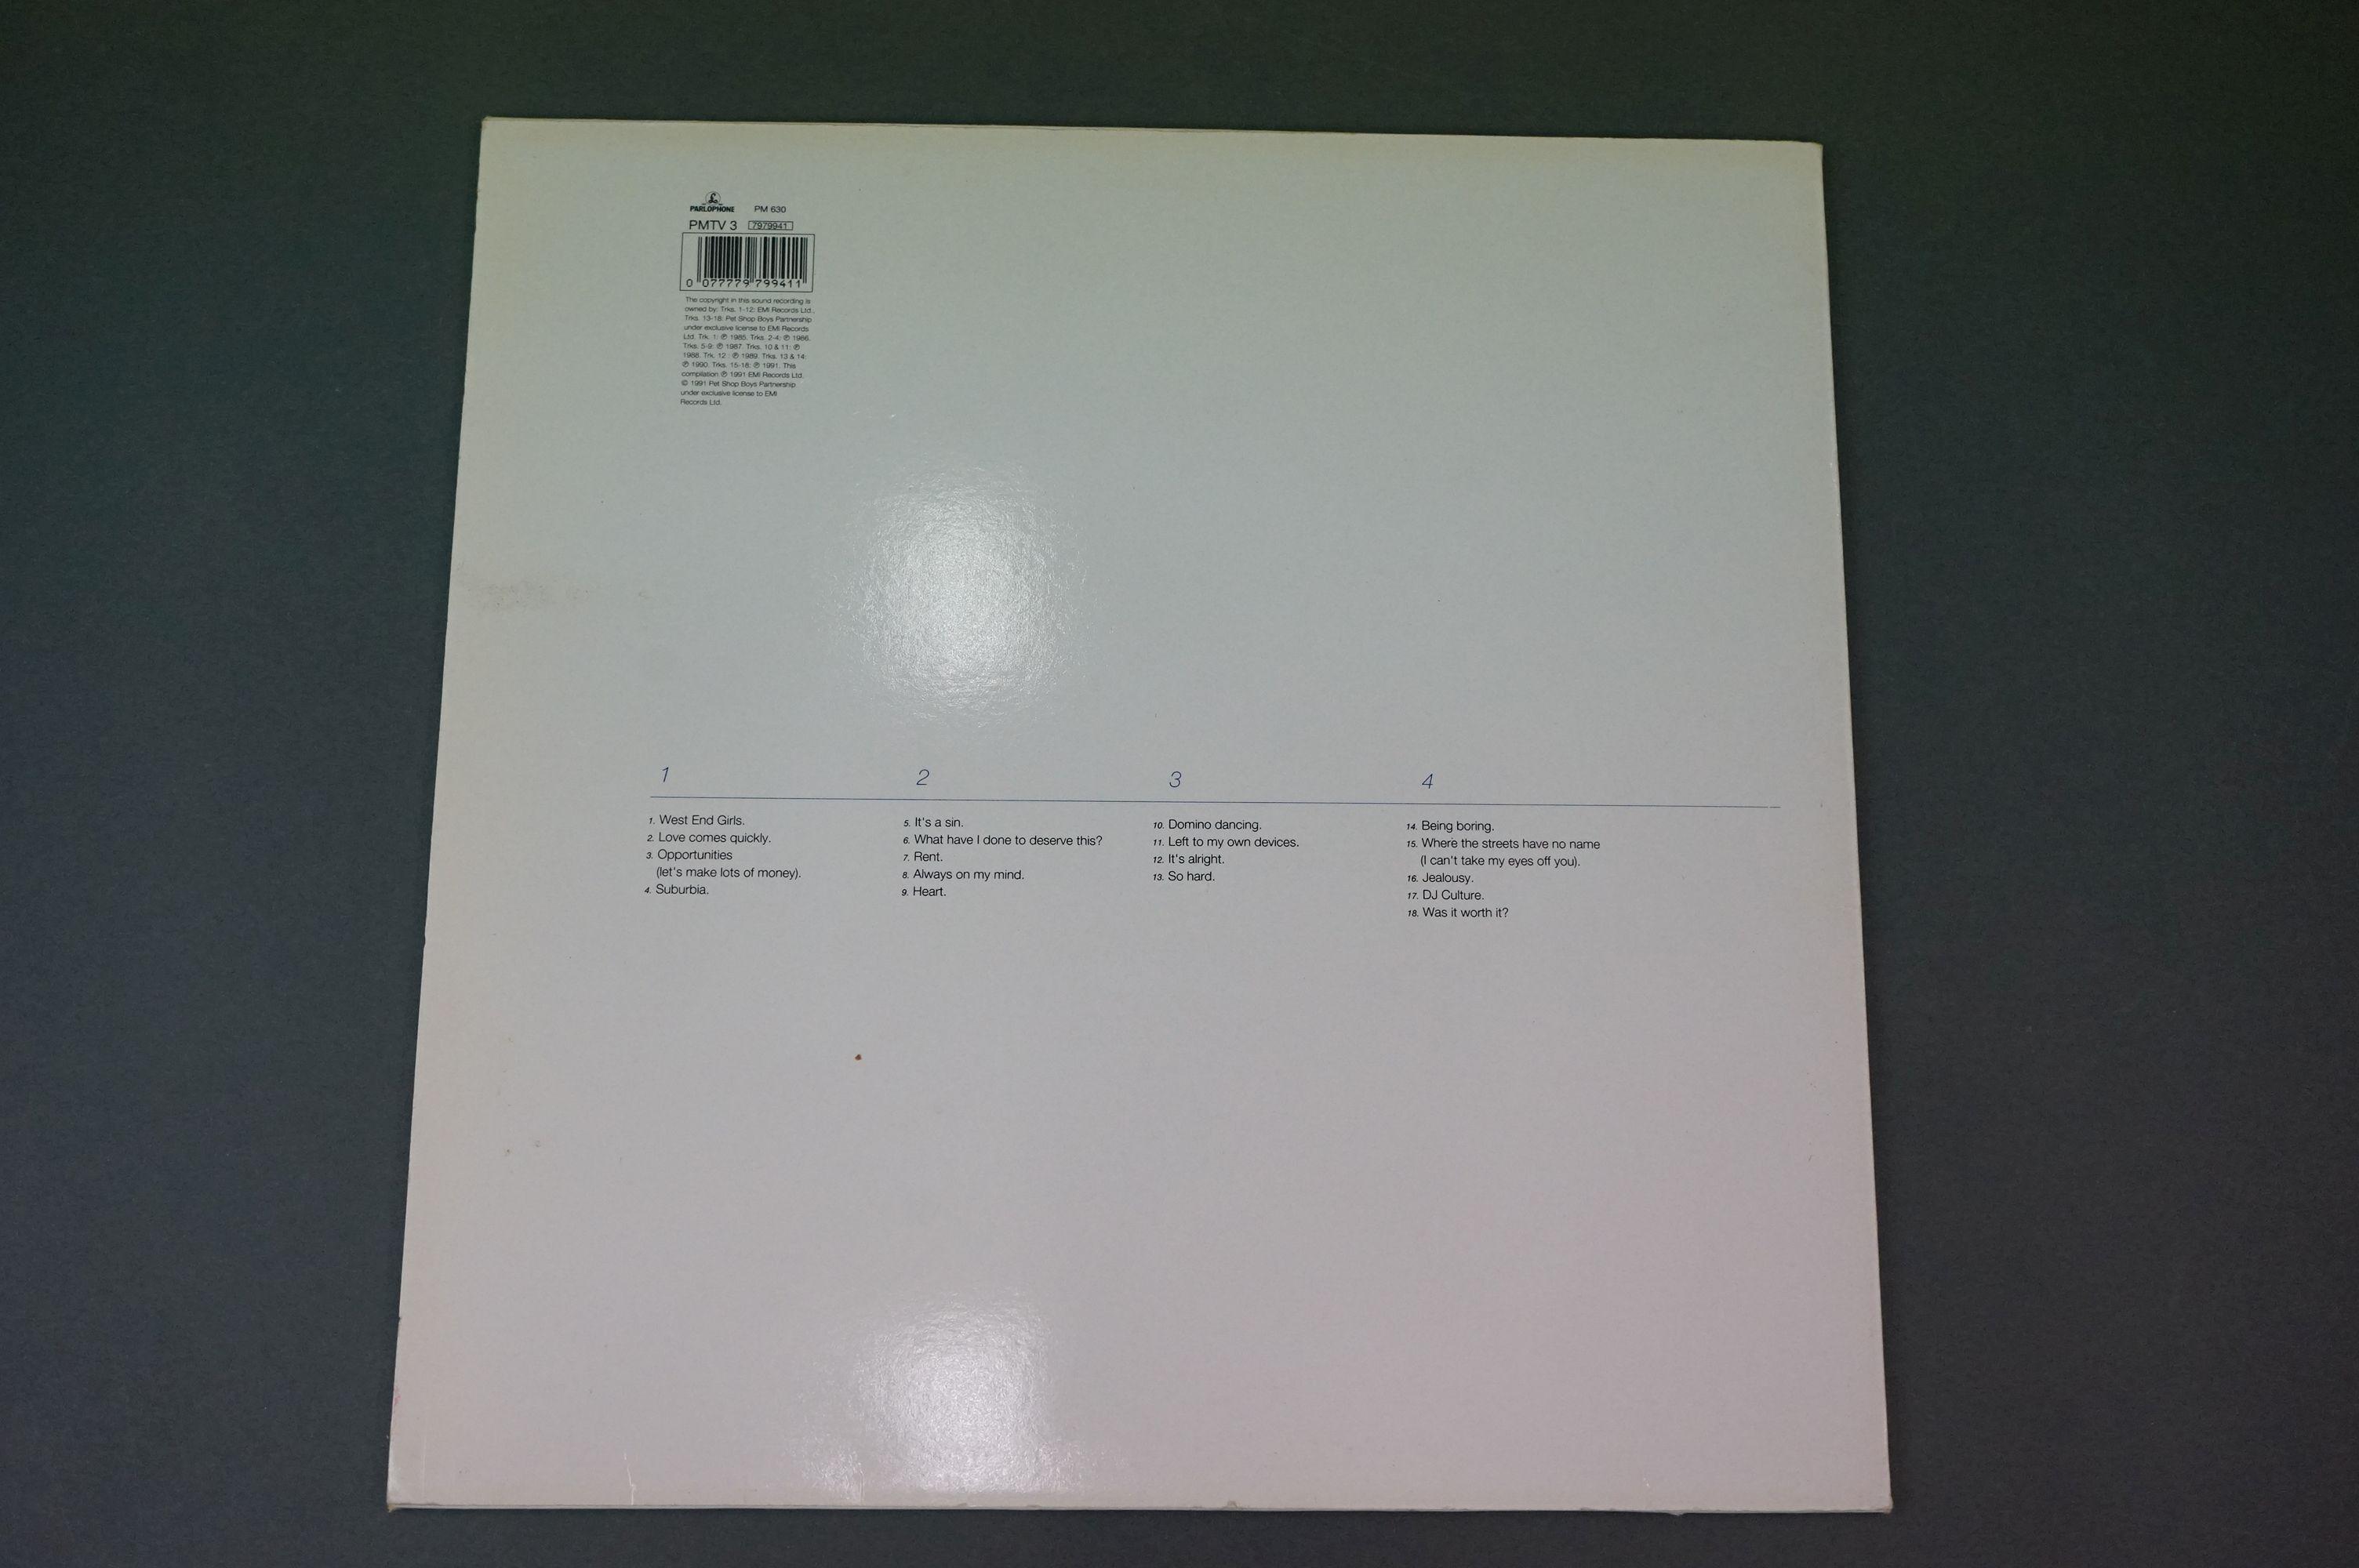 Vinyl - Pet Shop Boys Discography Double Album on Parlophone PMTV3 in sleeves ex, vinyl vg+ - Image 6 of 6